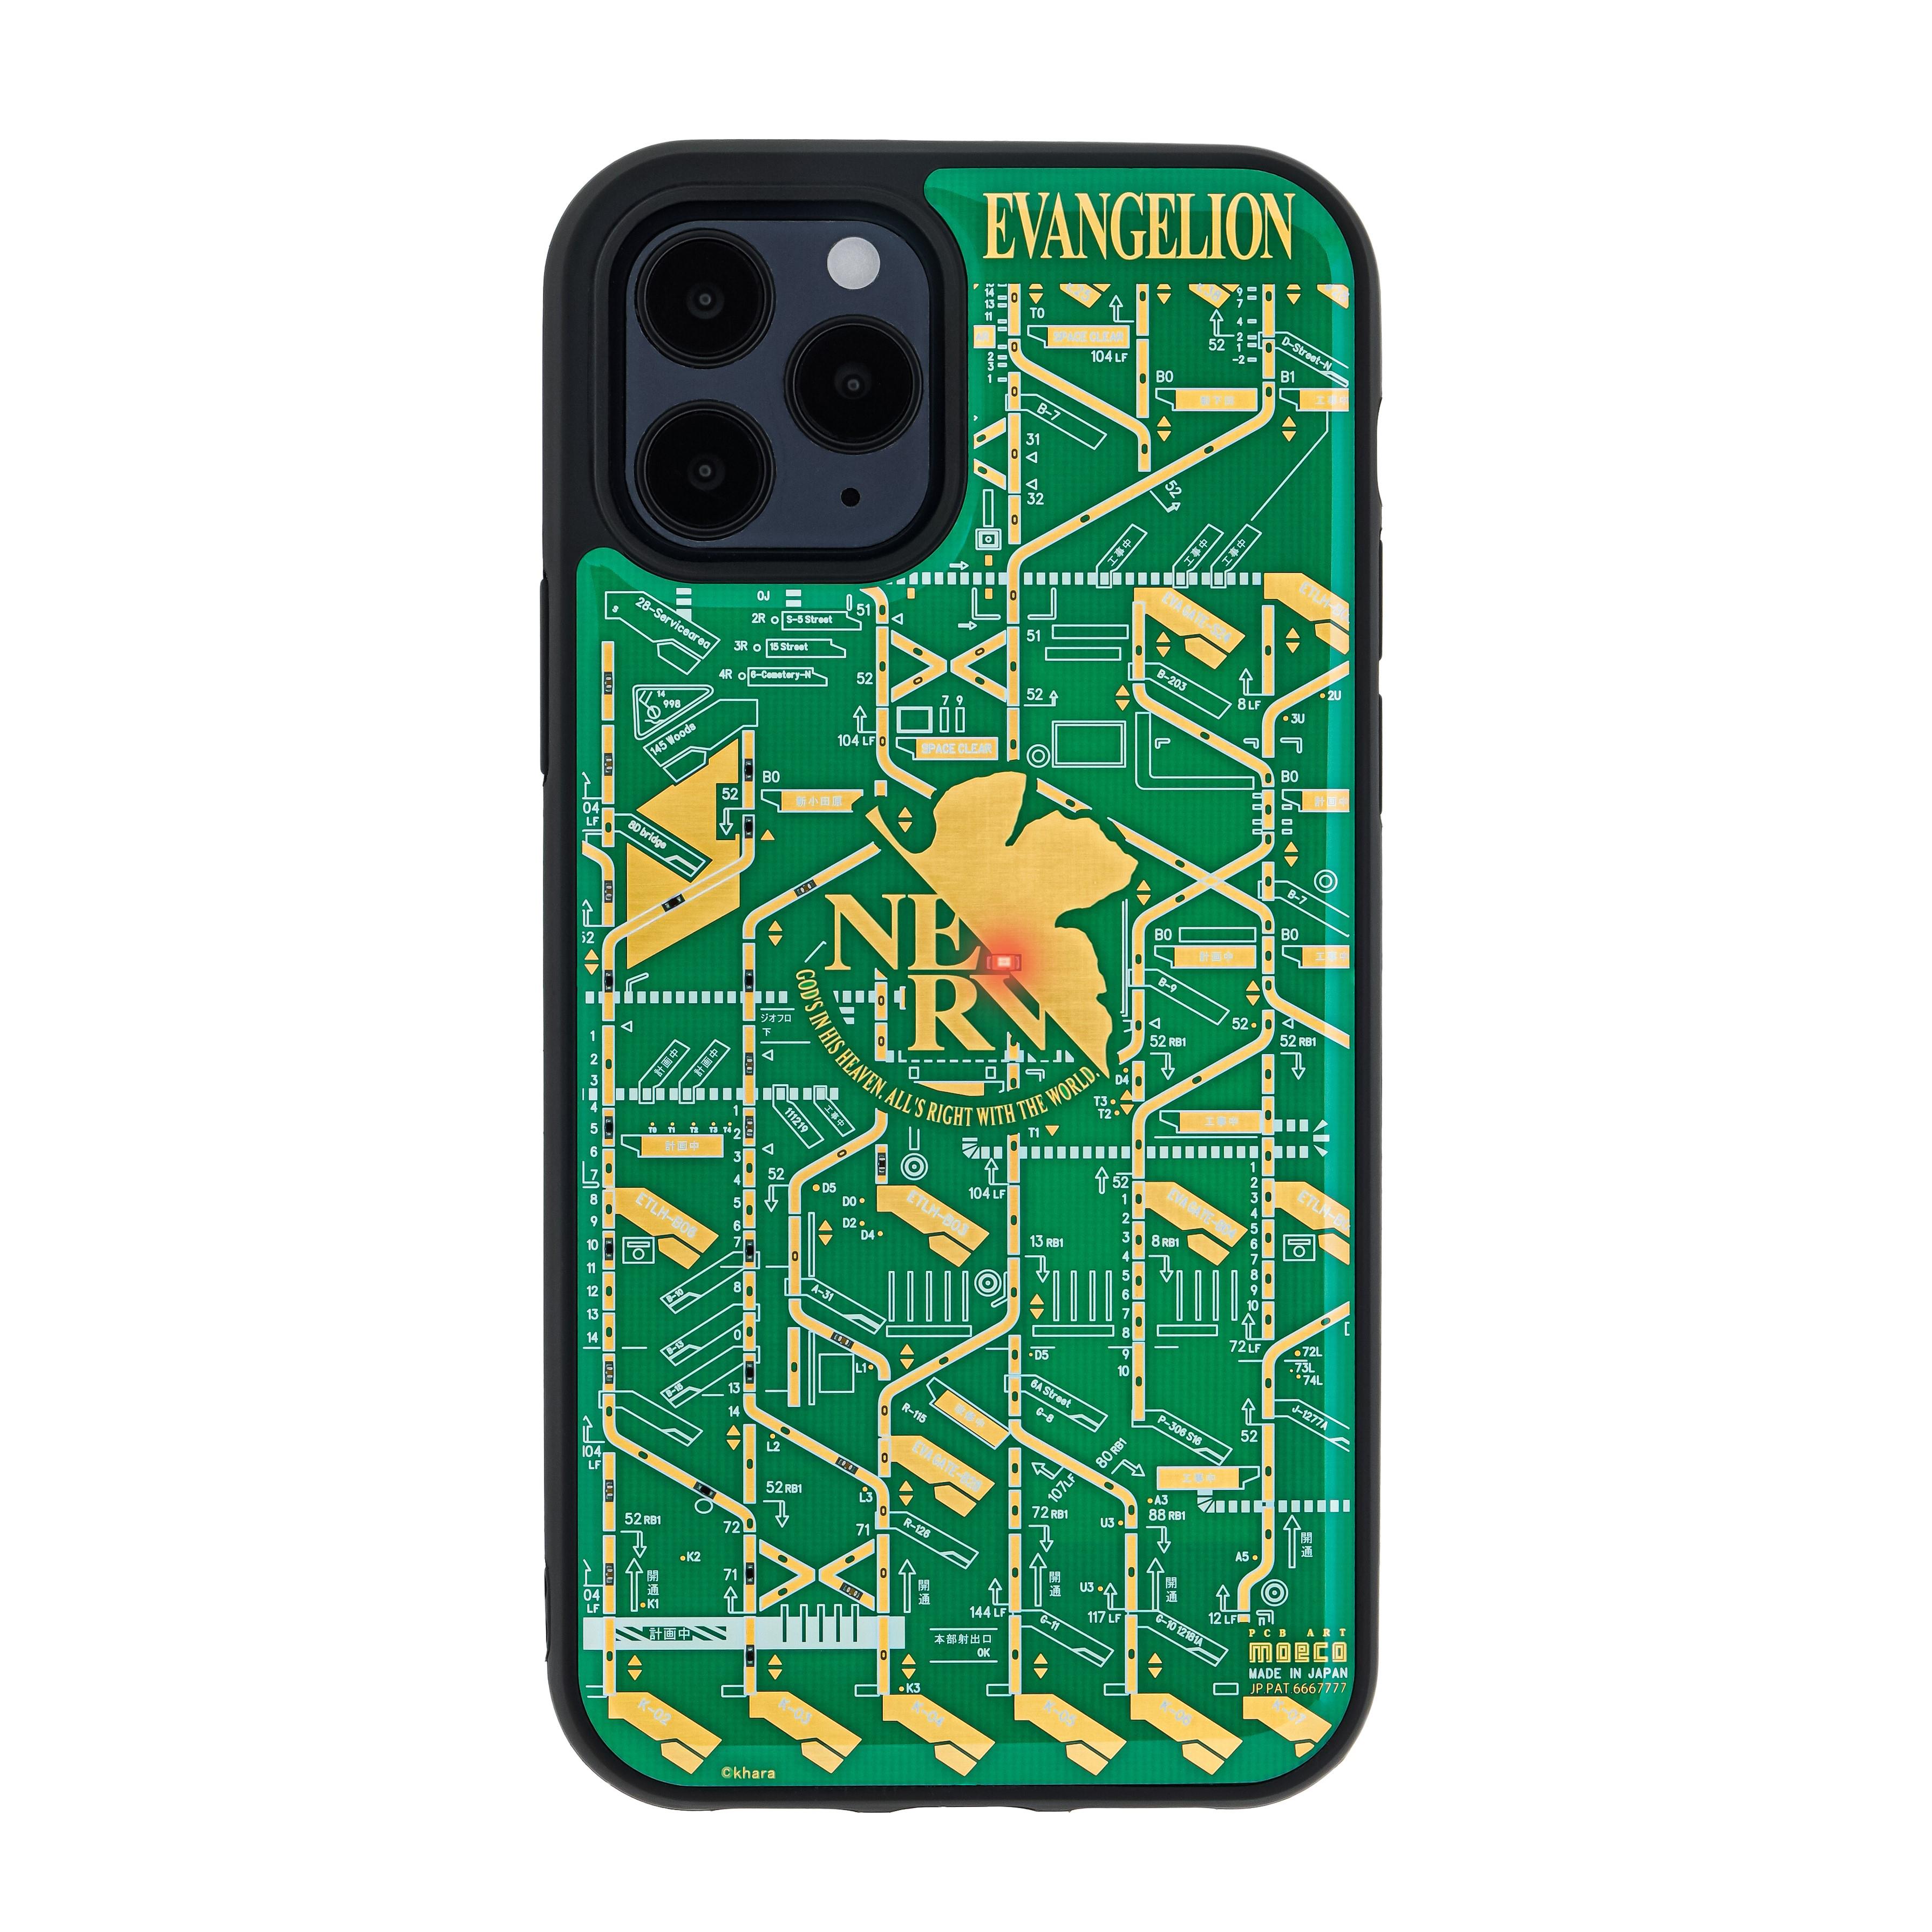 FLASH NERV 基板アート iPhone 12 / 12 Pro ケース 緑【東京回路線図A5クリアファイルをプレゼント】